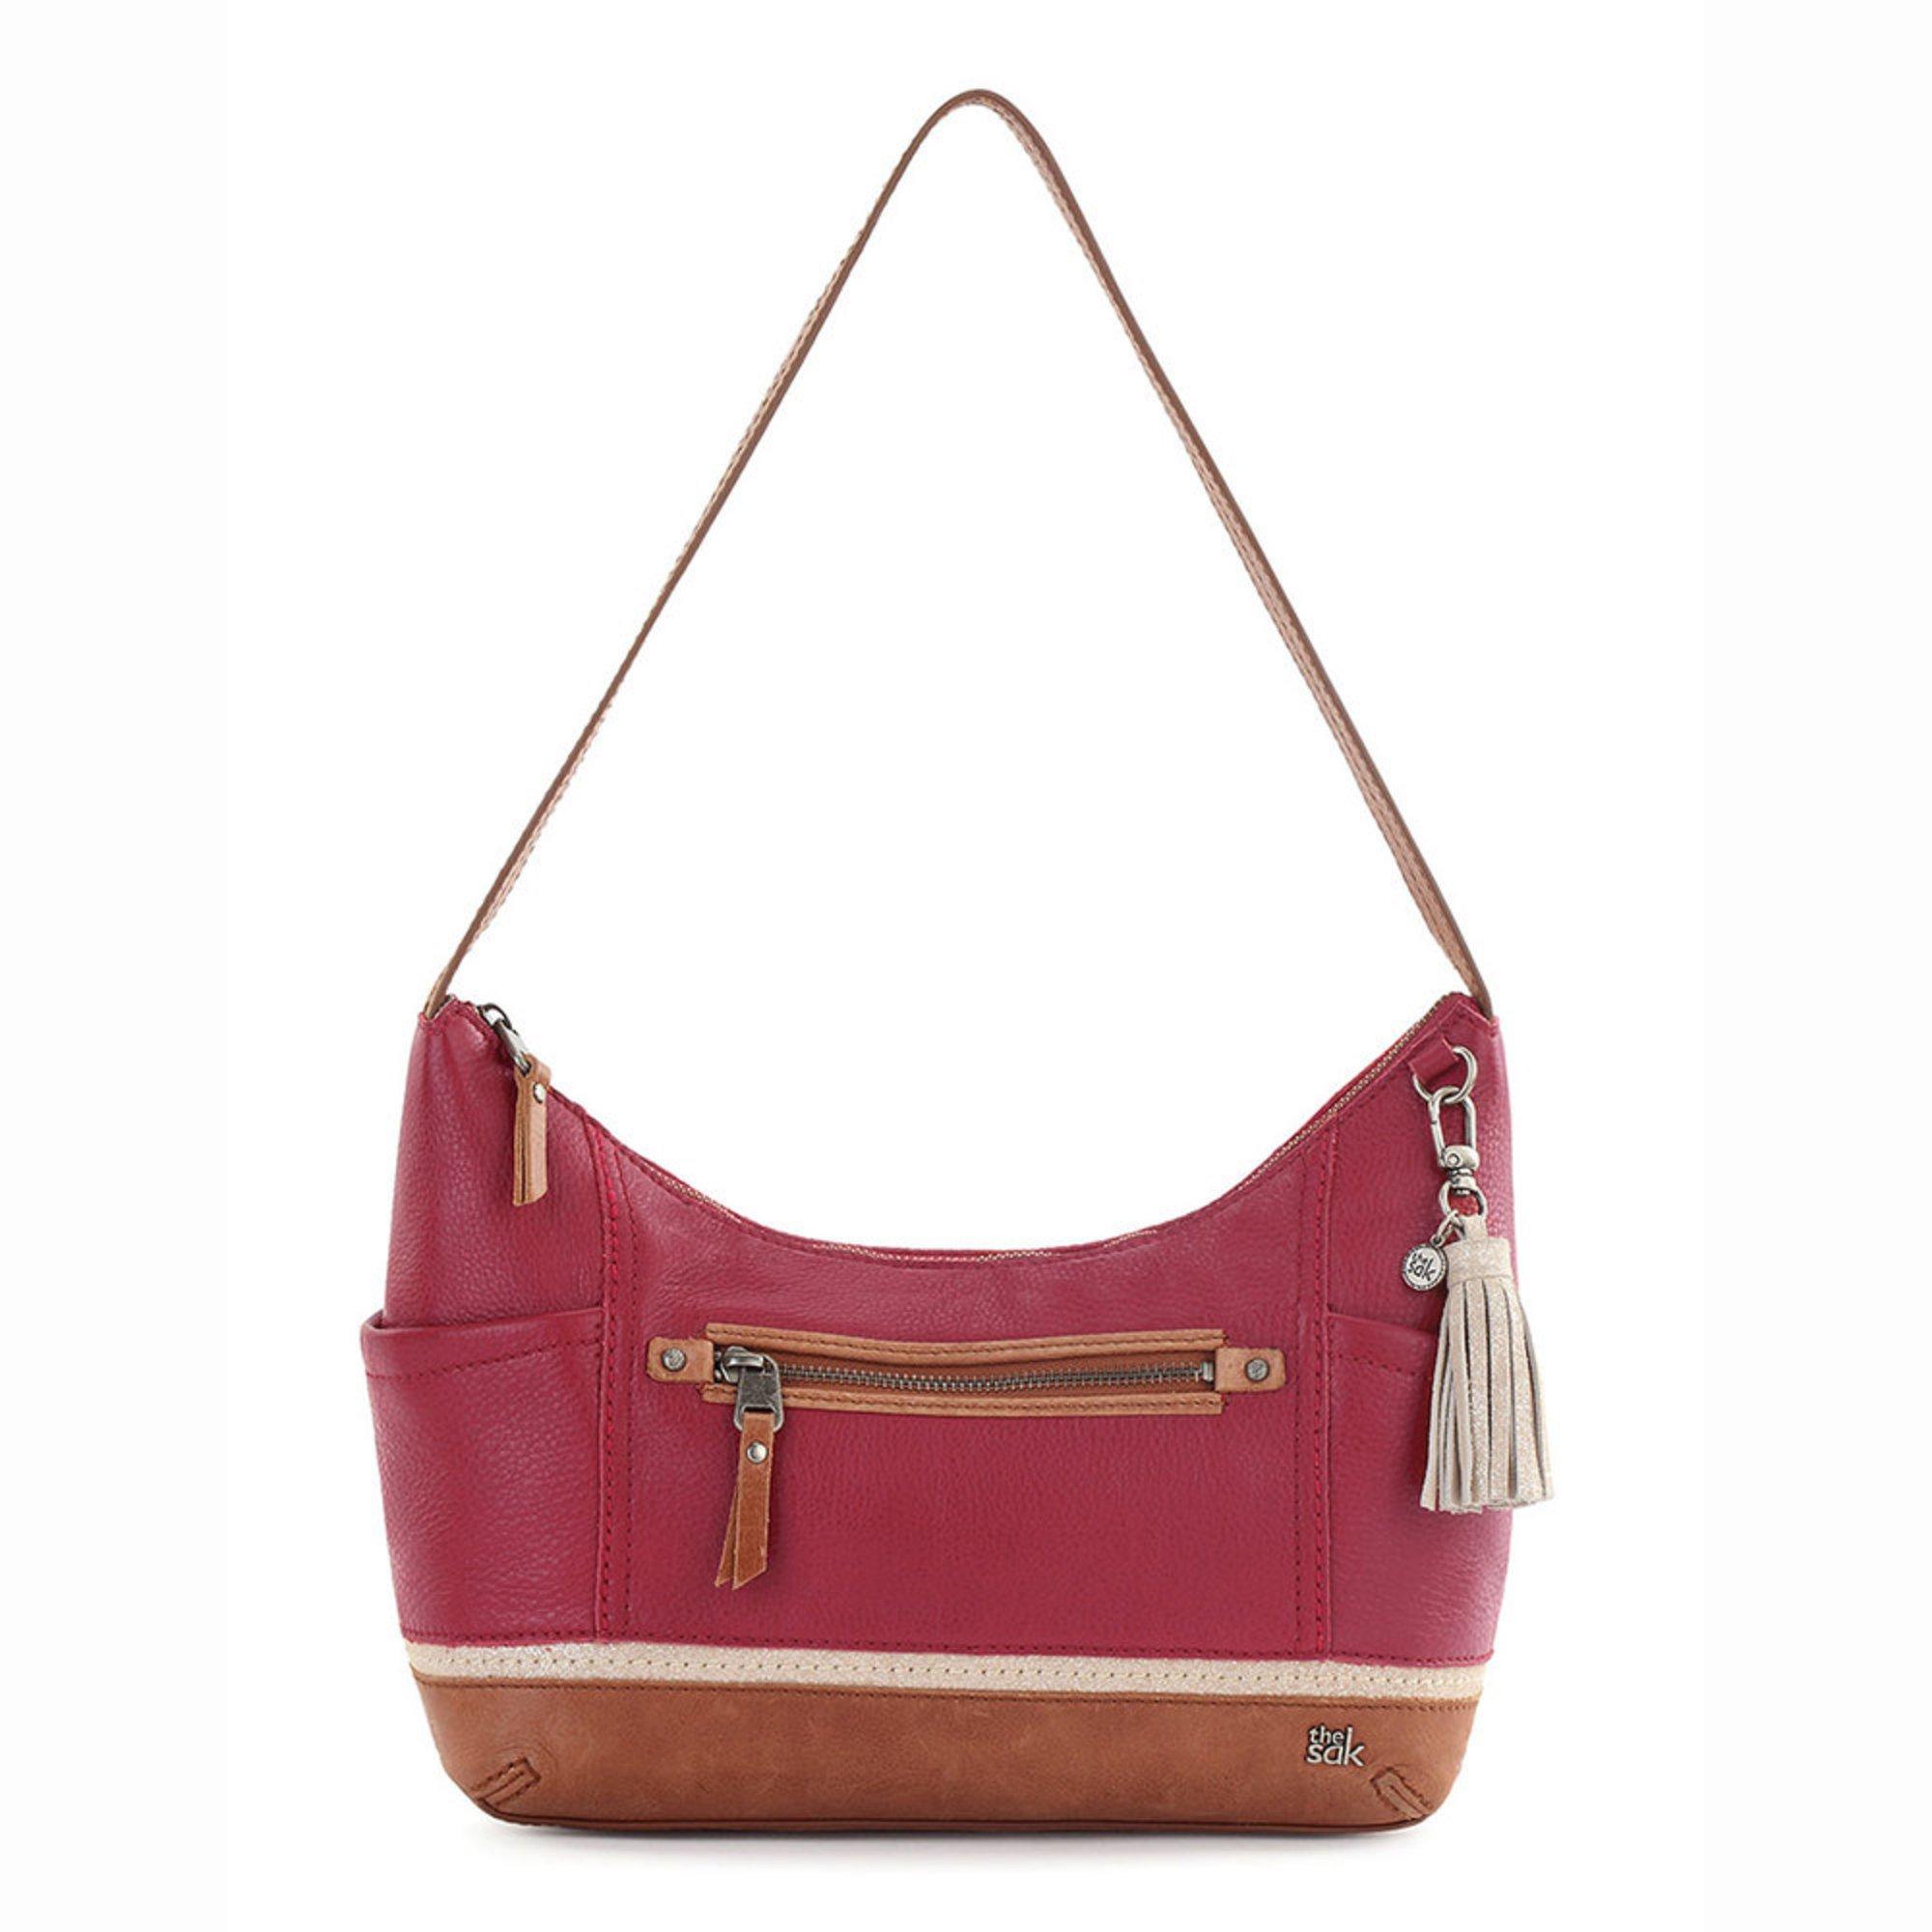 The Sak Kendra Hobo Hobo Bags Handbags Sunglasses Shop Your